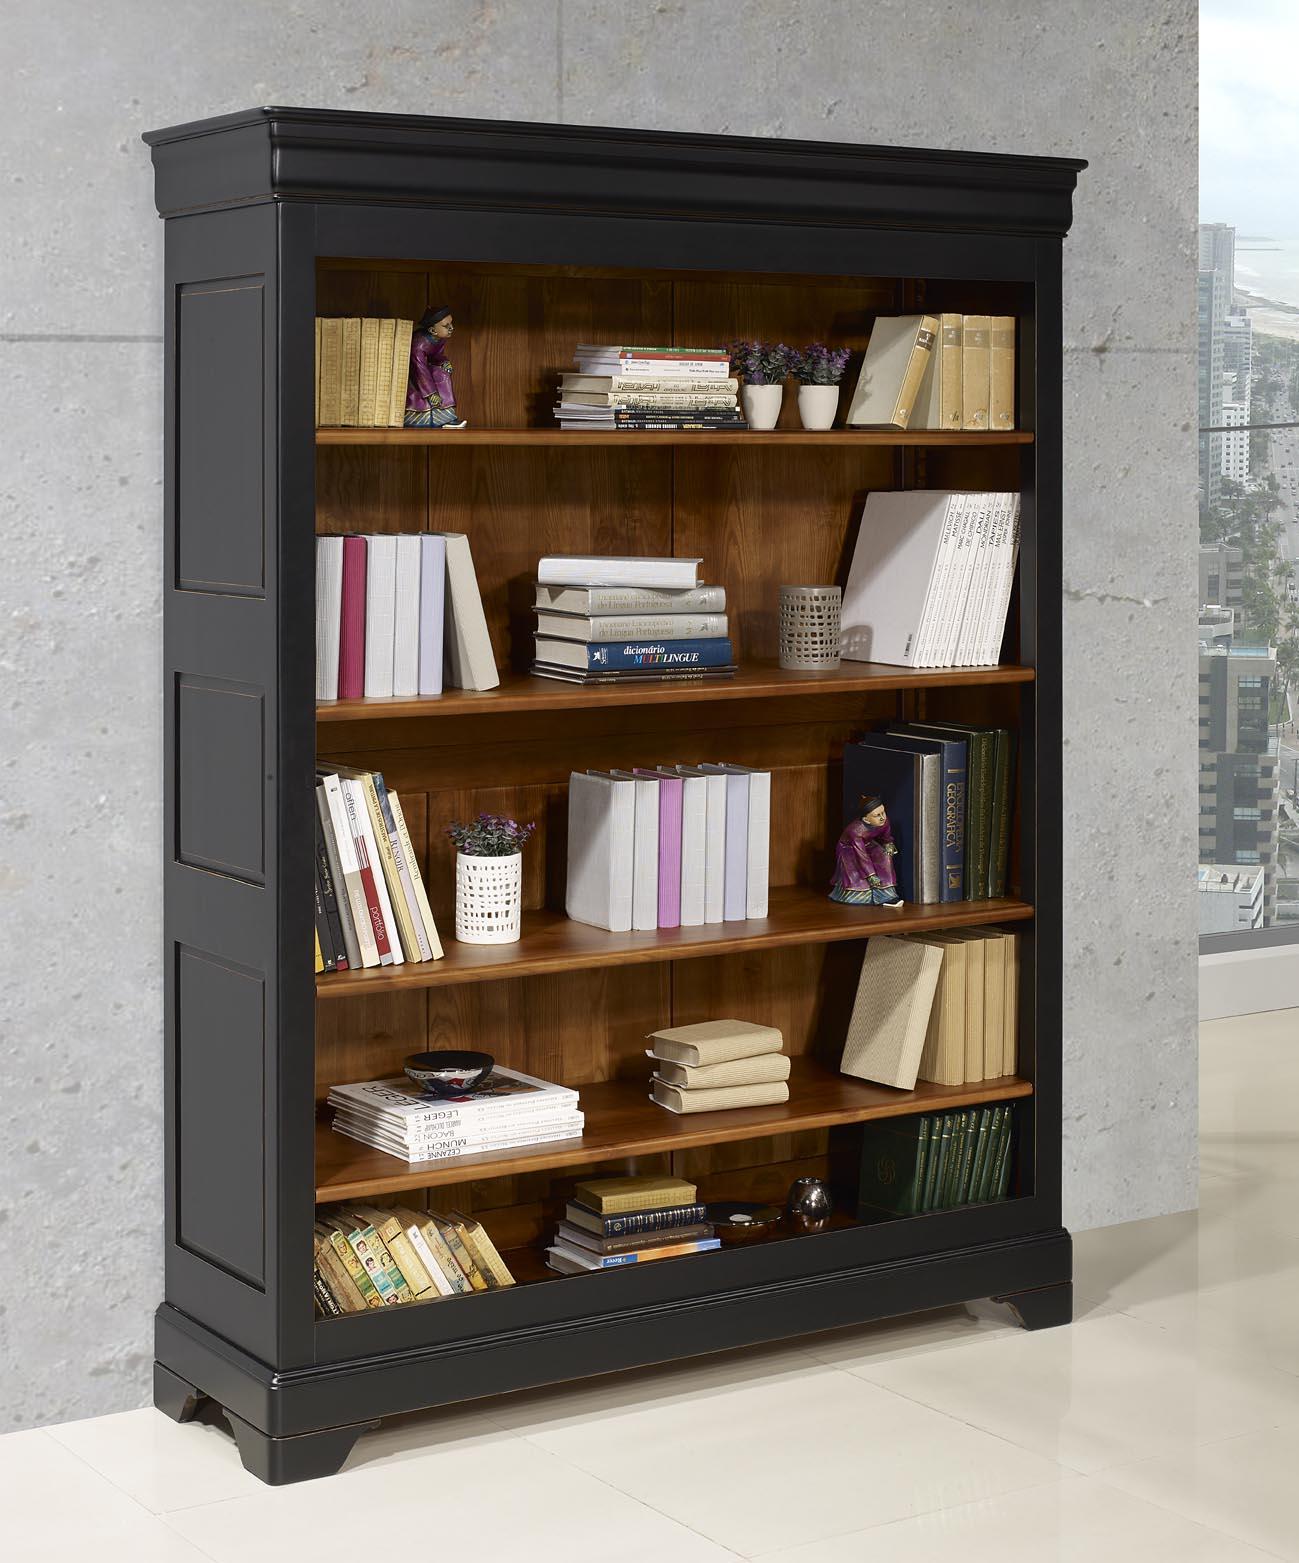 Biblioth Que En Merisier Massif De Style Louis Philippe Noir Us  # Bibliotheque Directoire Avec Etageres En Merisier